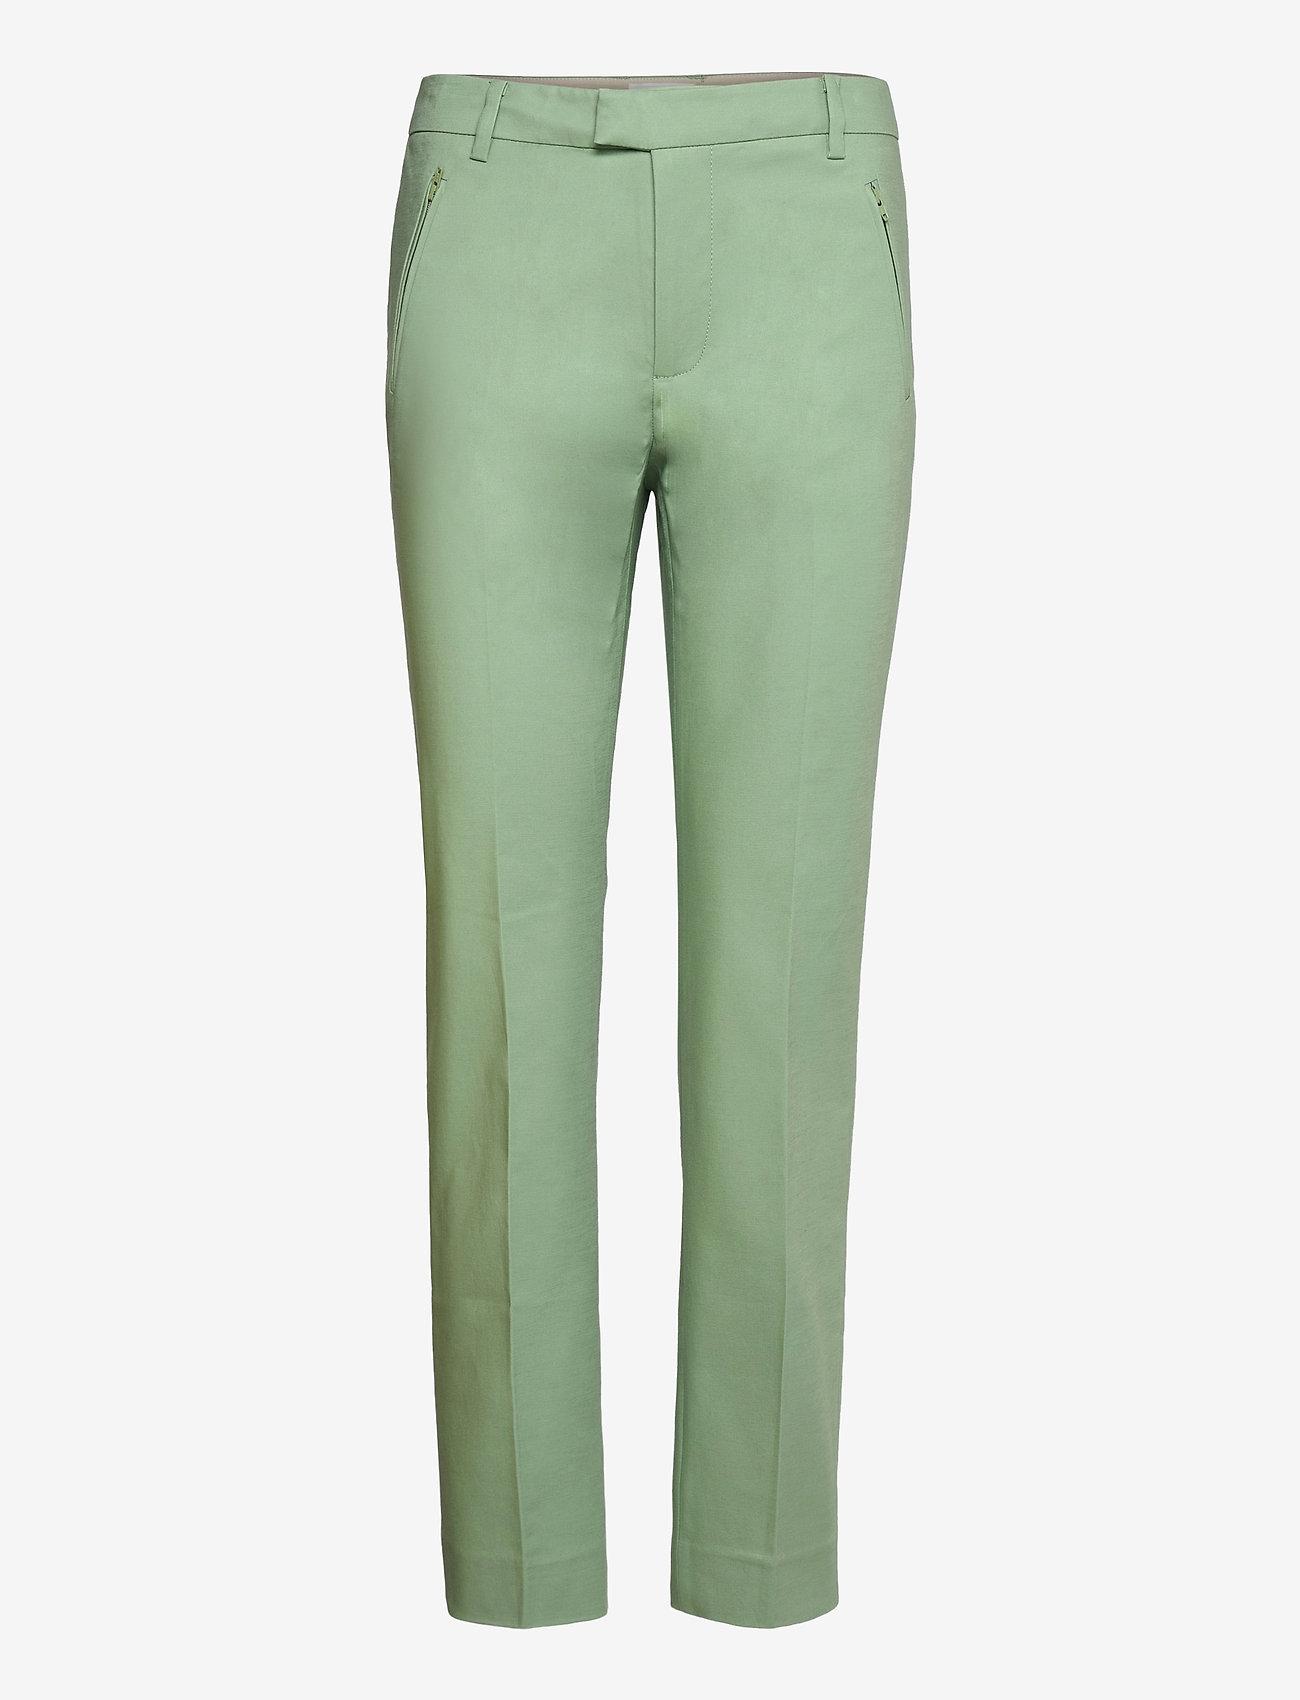 Noa Noa - Trousers - slim fit bukser - basil - 0